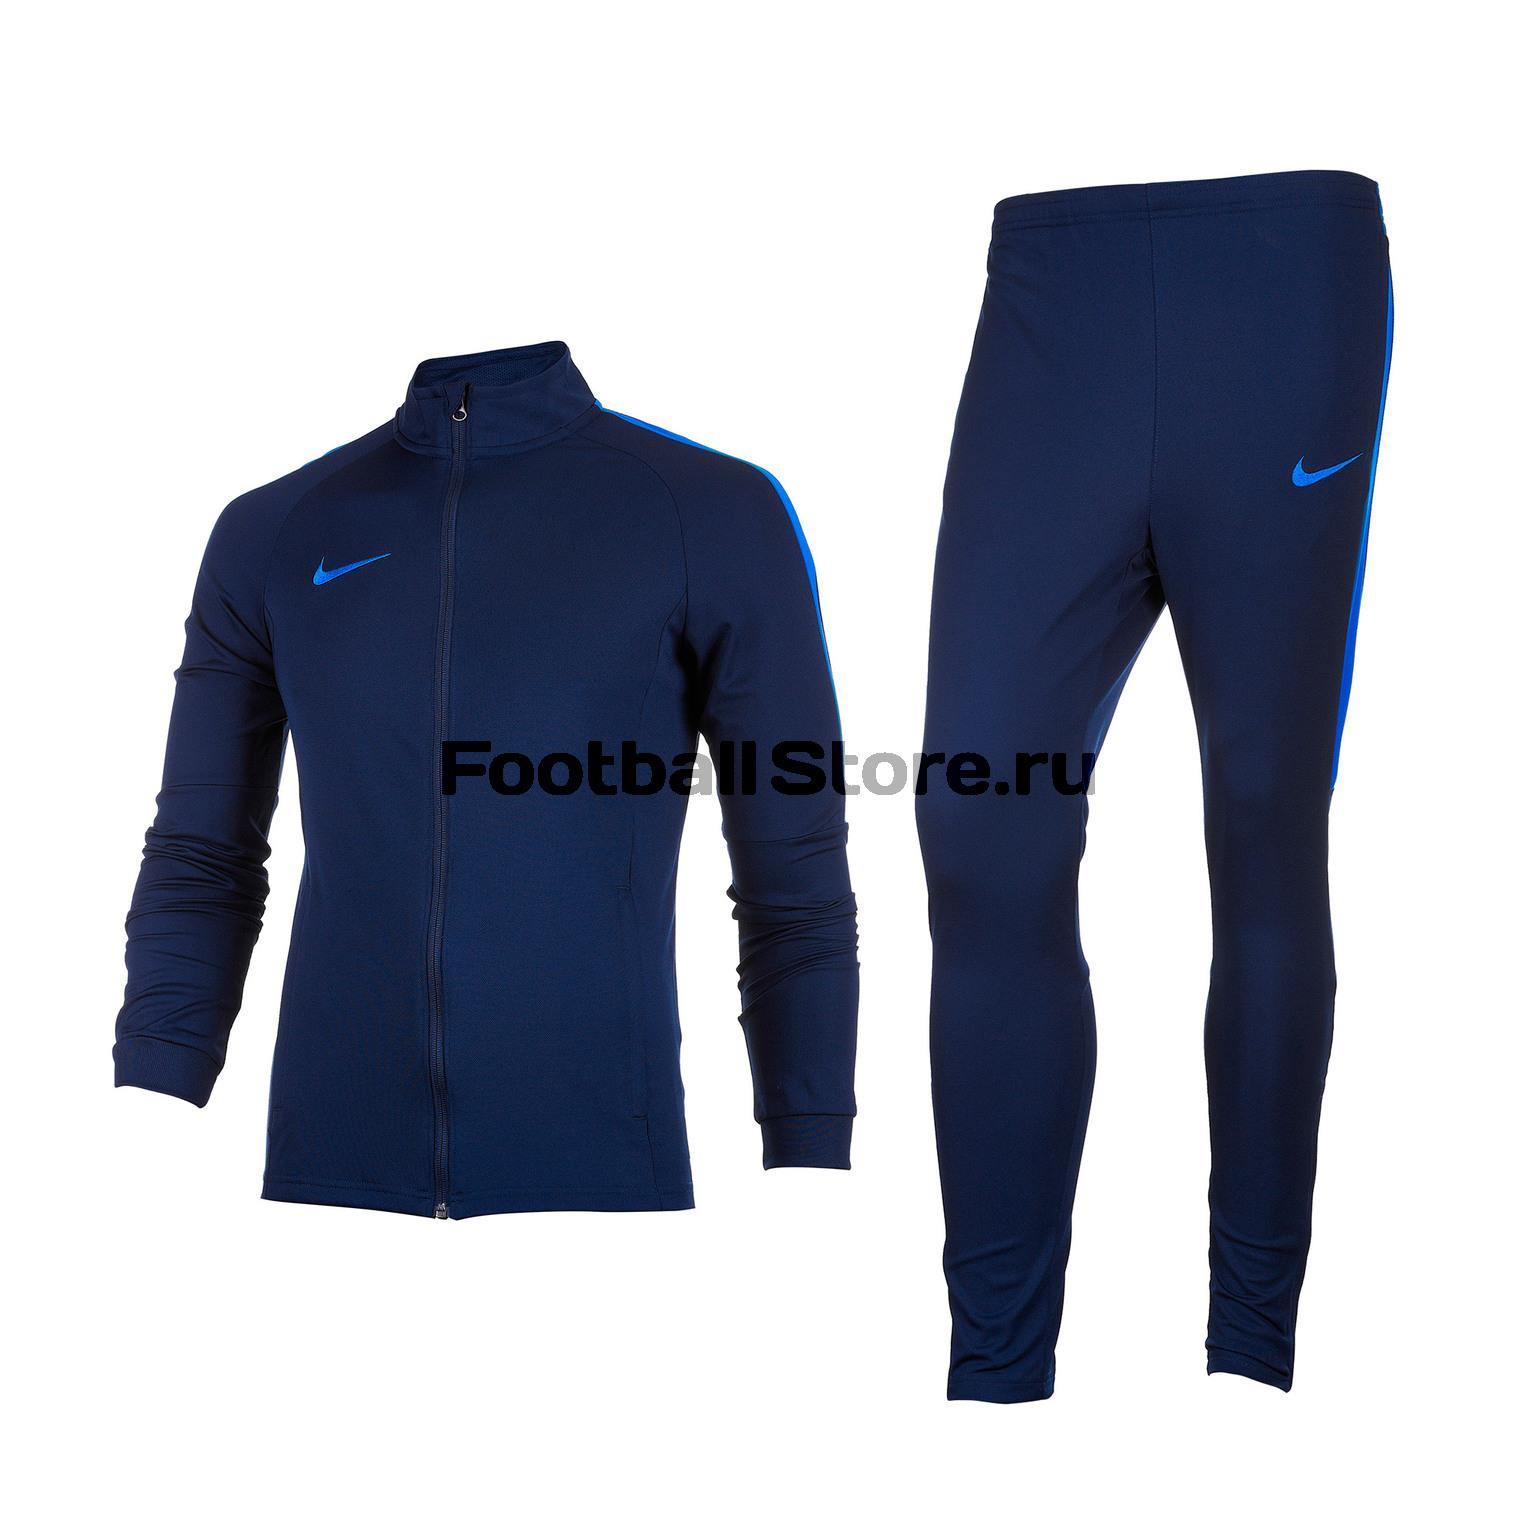 Костюм спортивный Nike DRY SUIT 844327-458 костюм спортивный nike m dry acdmy trk suit 844327 451